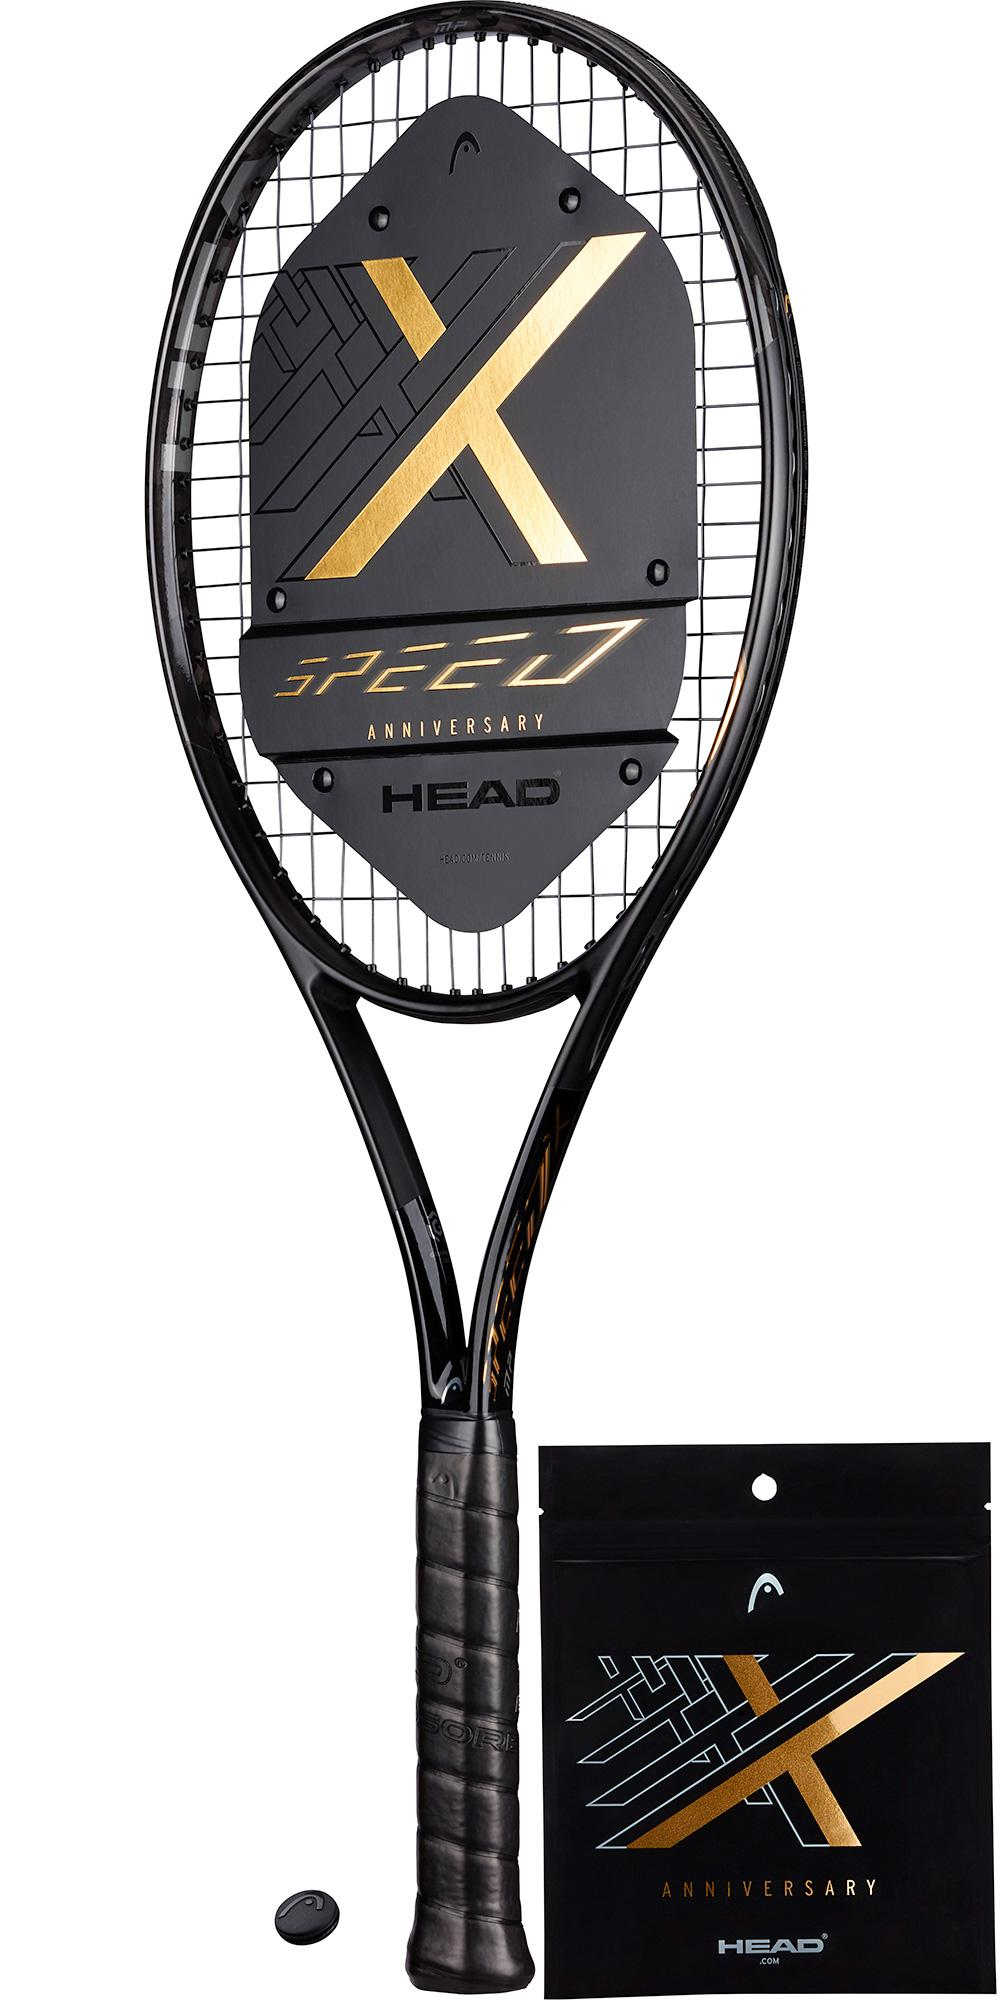 Raquete de Tênis Head Graphene 360 Speed MP X (Comemorativa 10 anos)